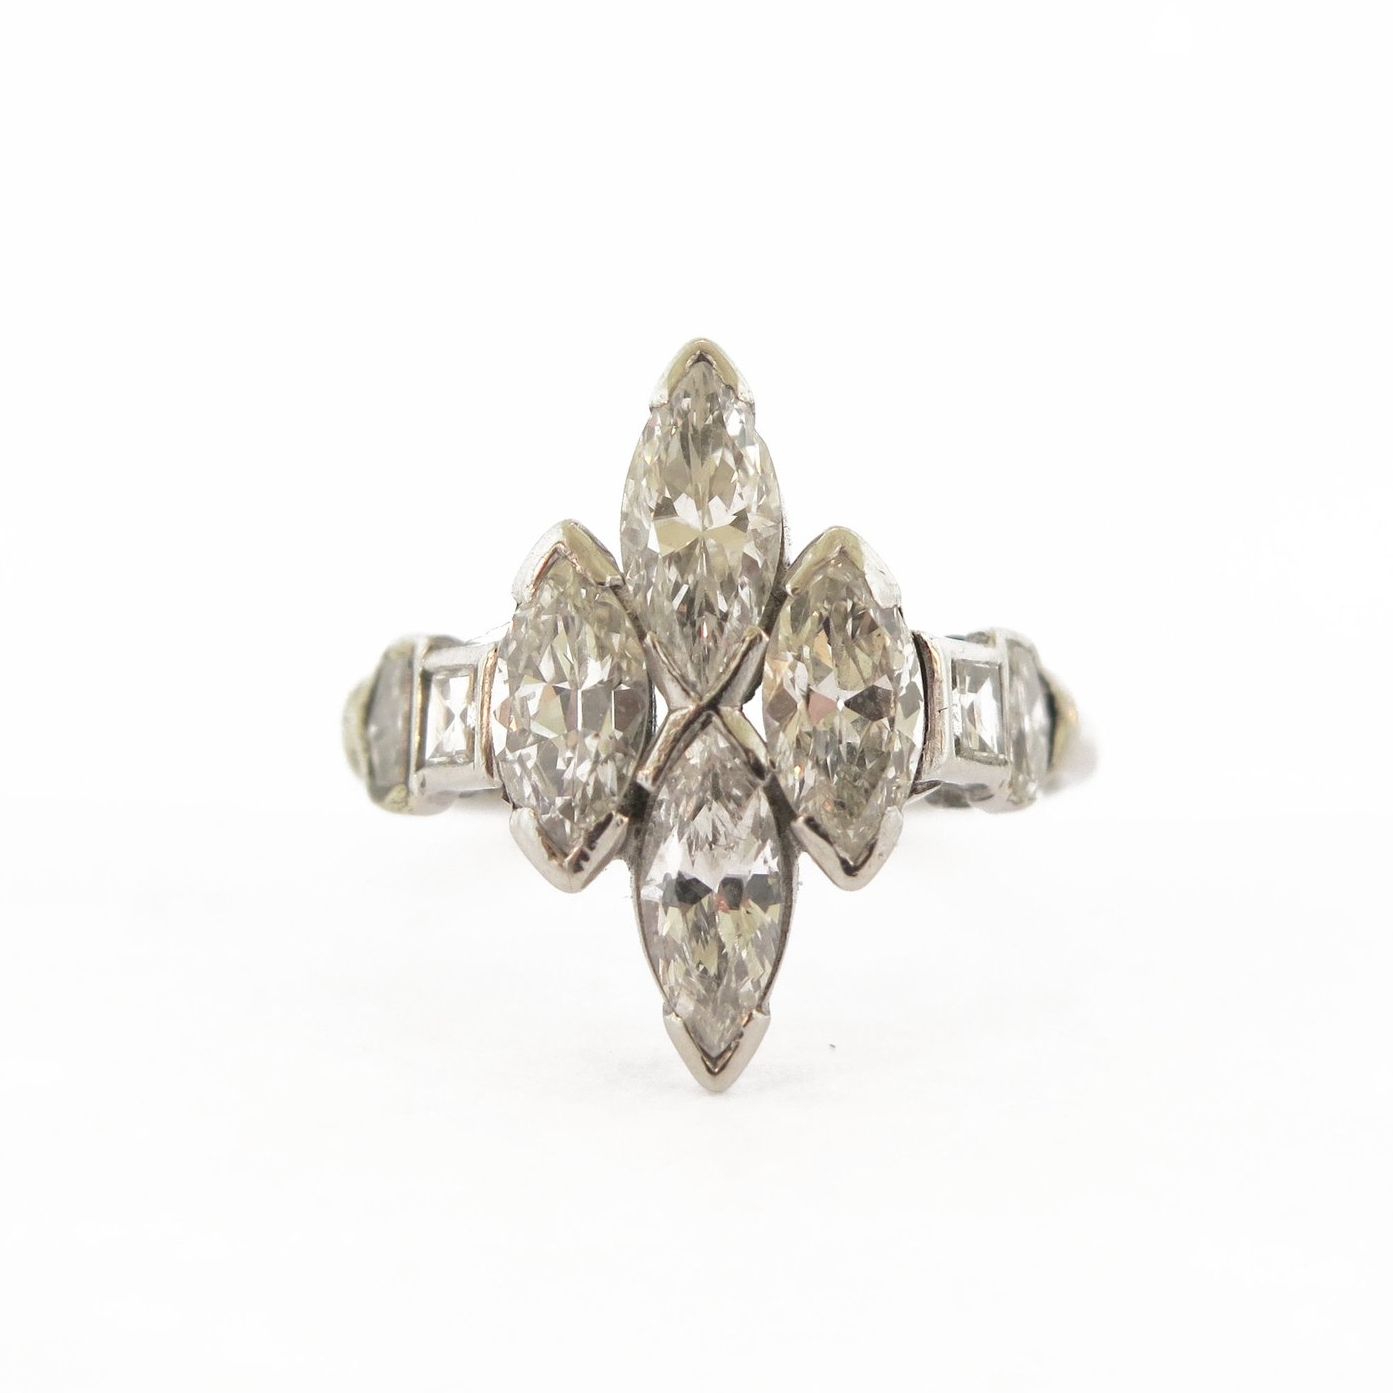 Navette Marquise Diamond Ring